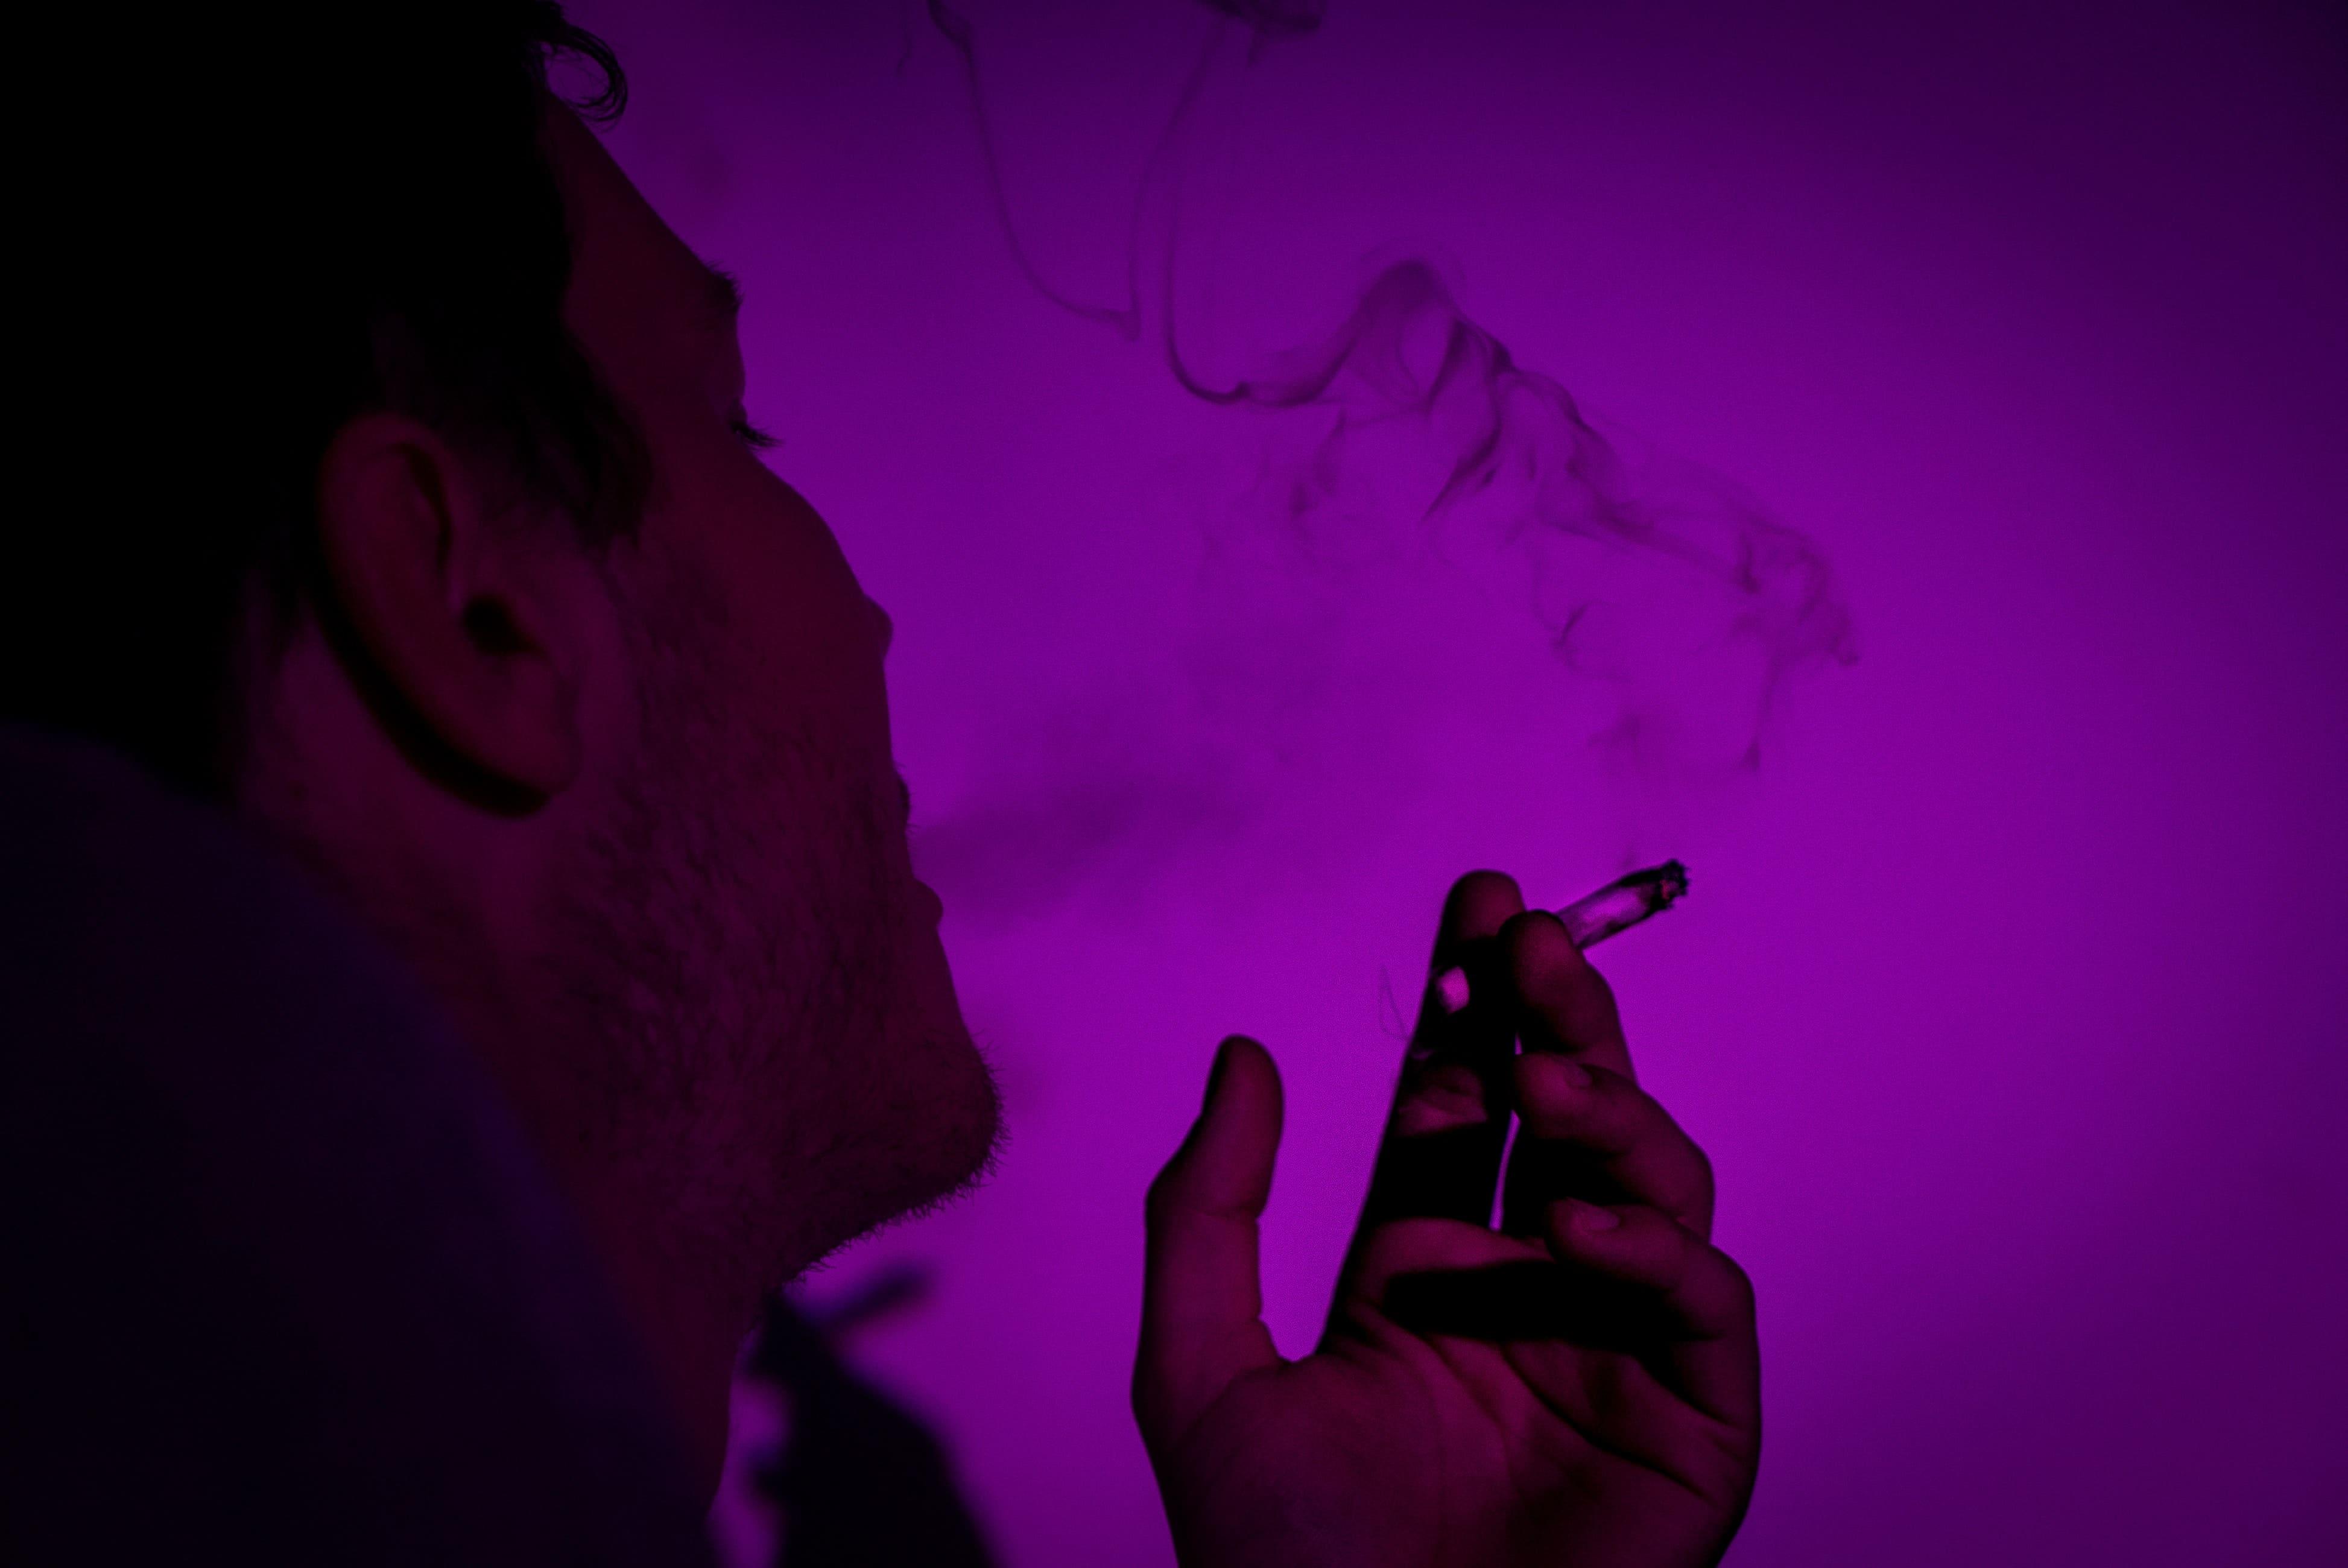 Nación Cannabis | Cannabis: ¿qué efectos produce?